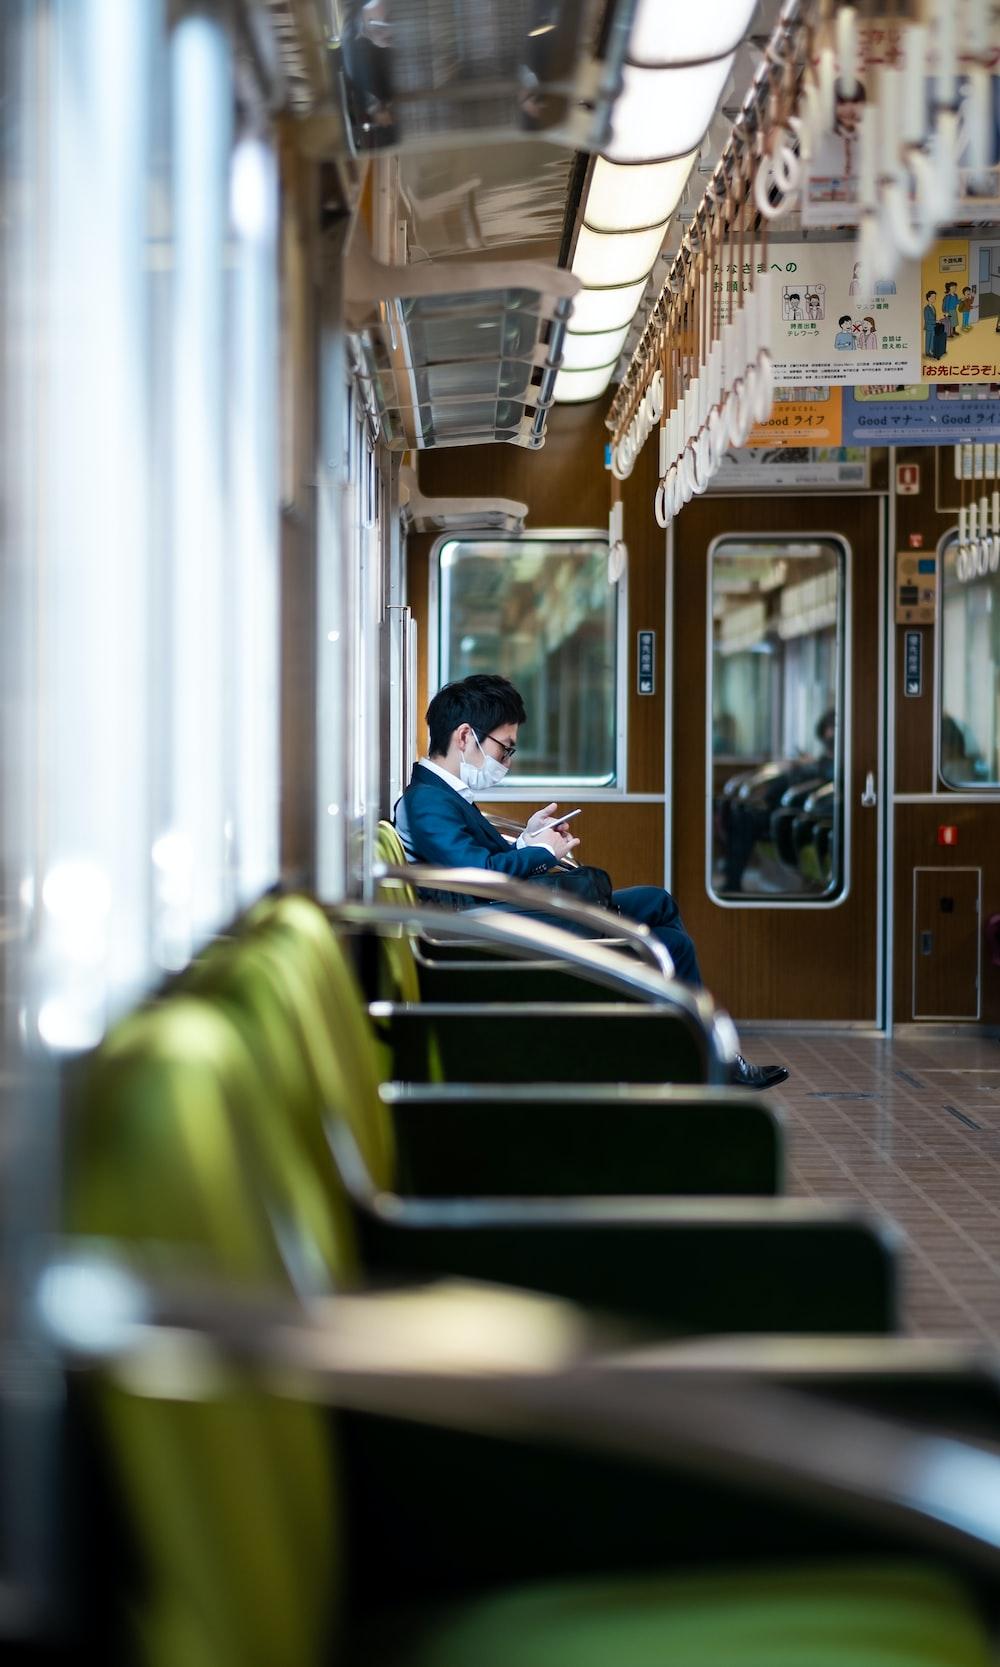 man in blue dress shirt sitting on train seat